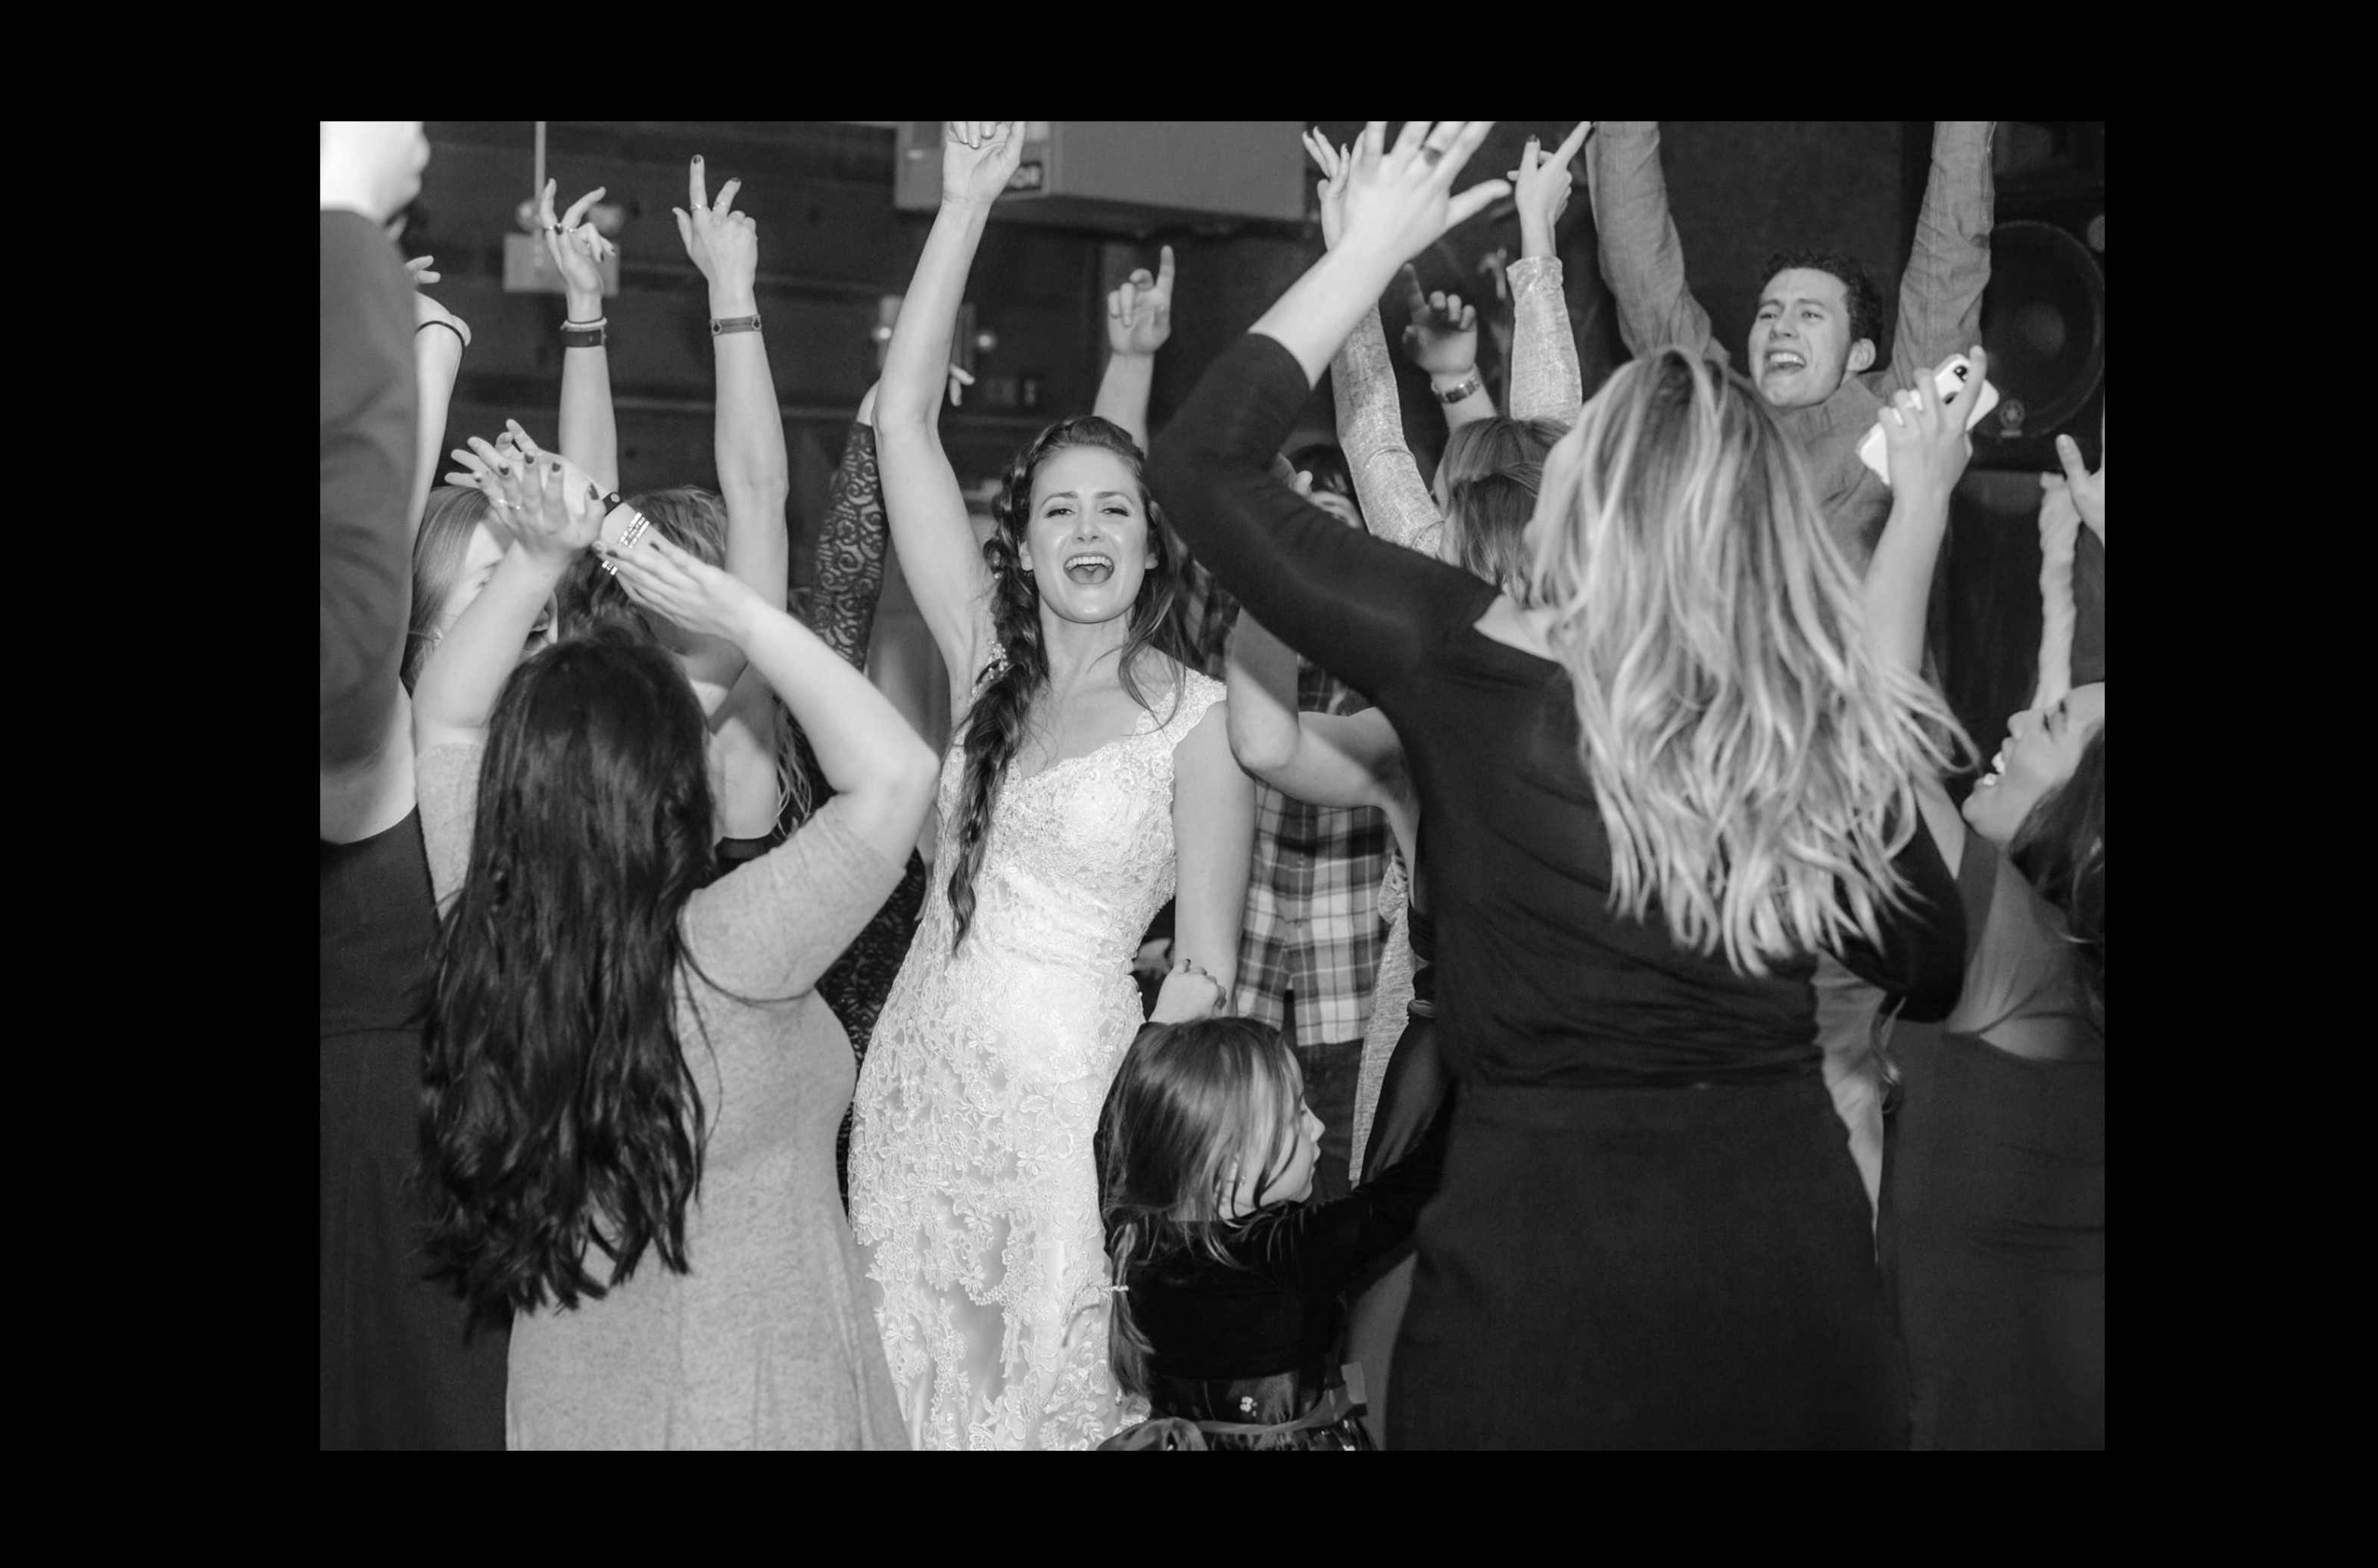 Dance stuf